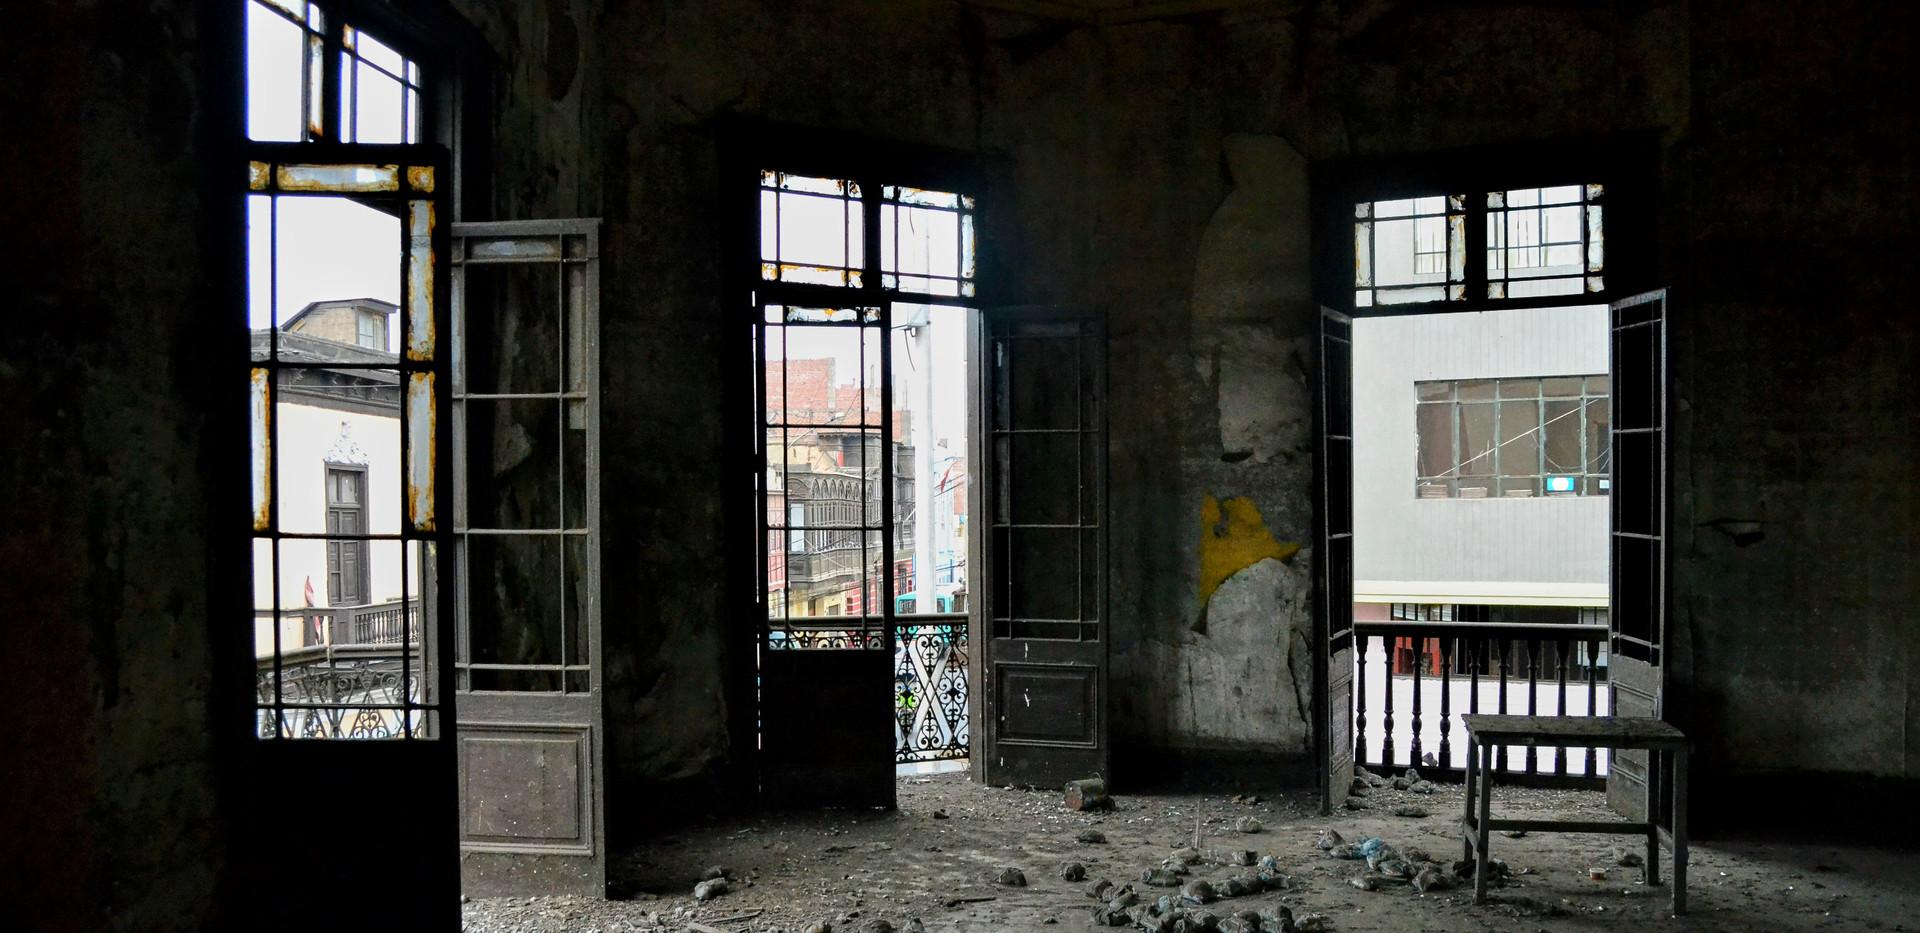 Colegio Real _ Puertas 2do piso 8.jpg